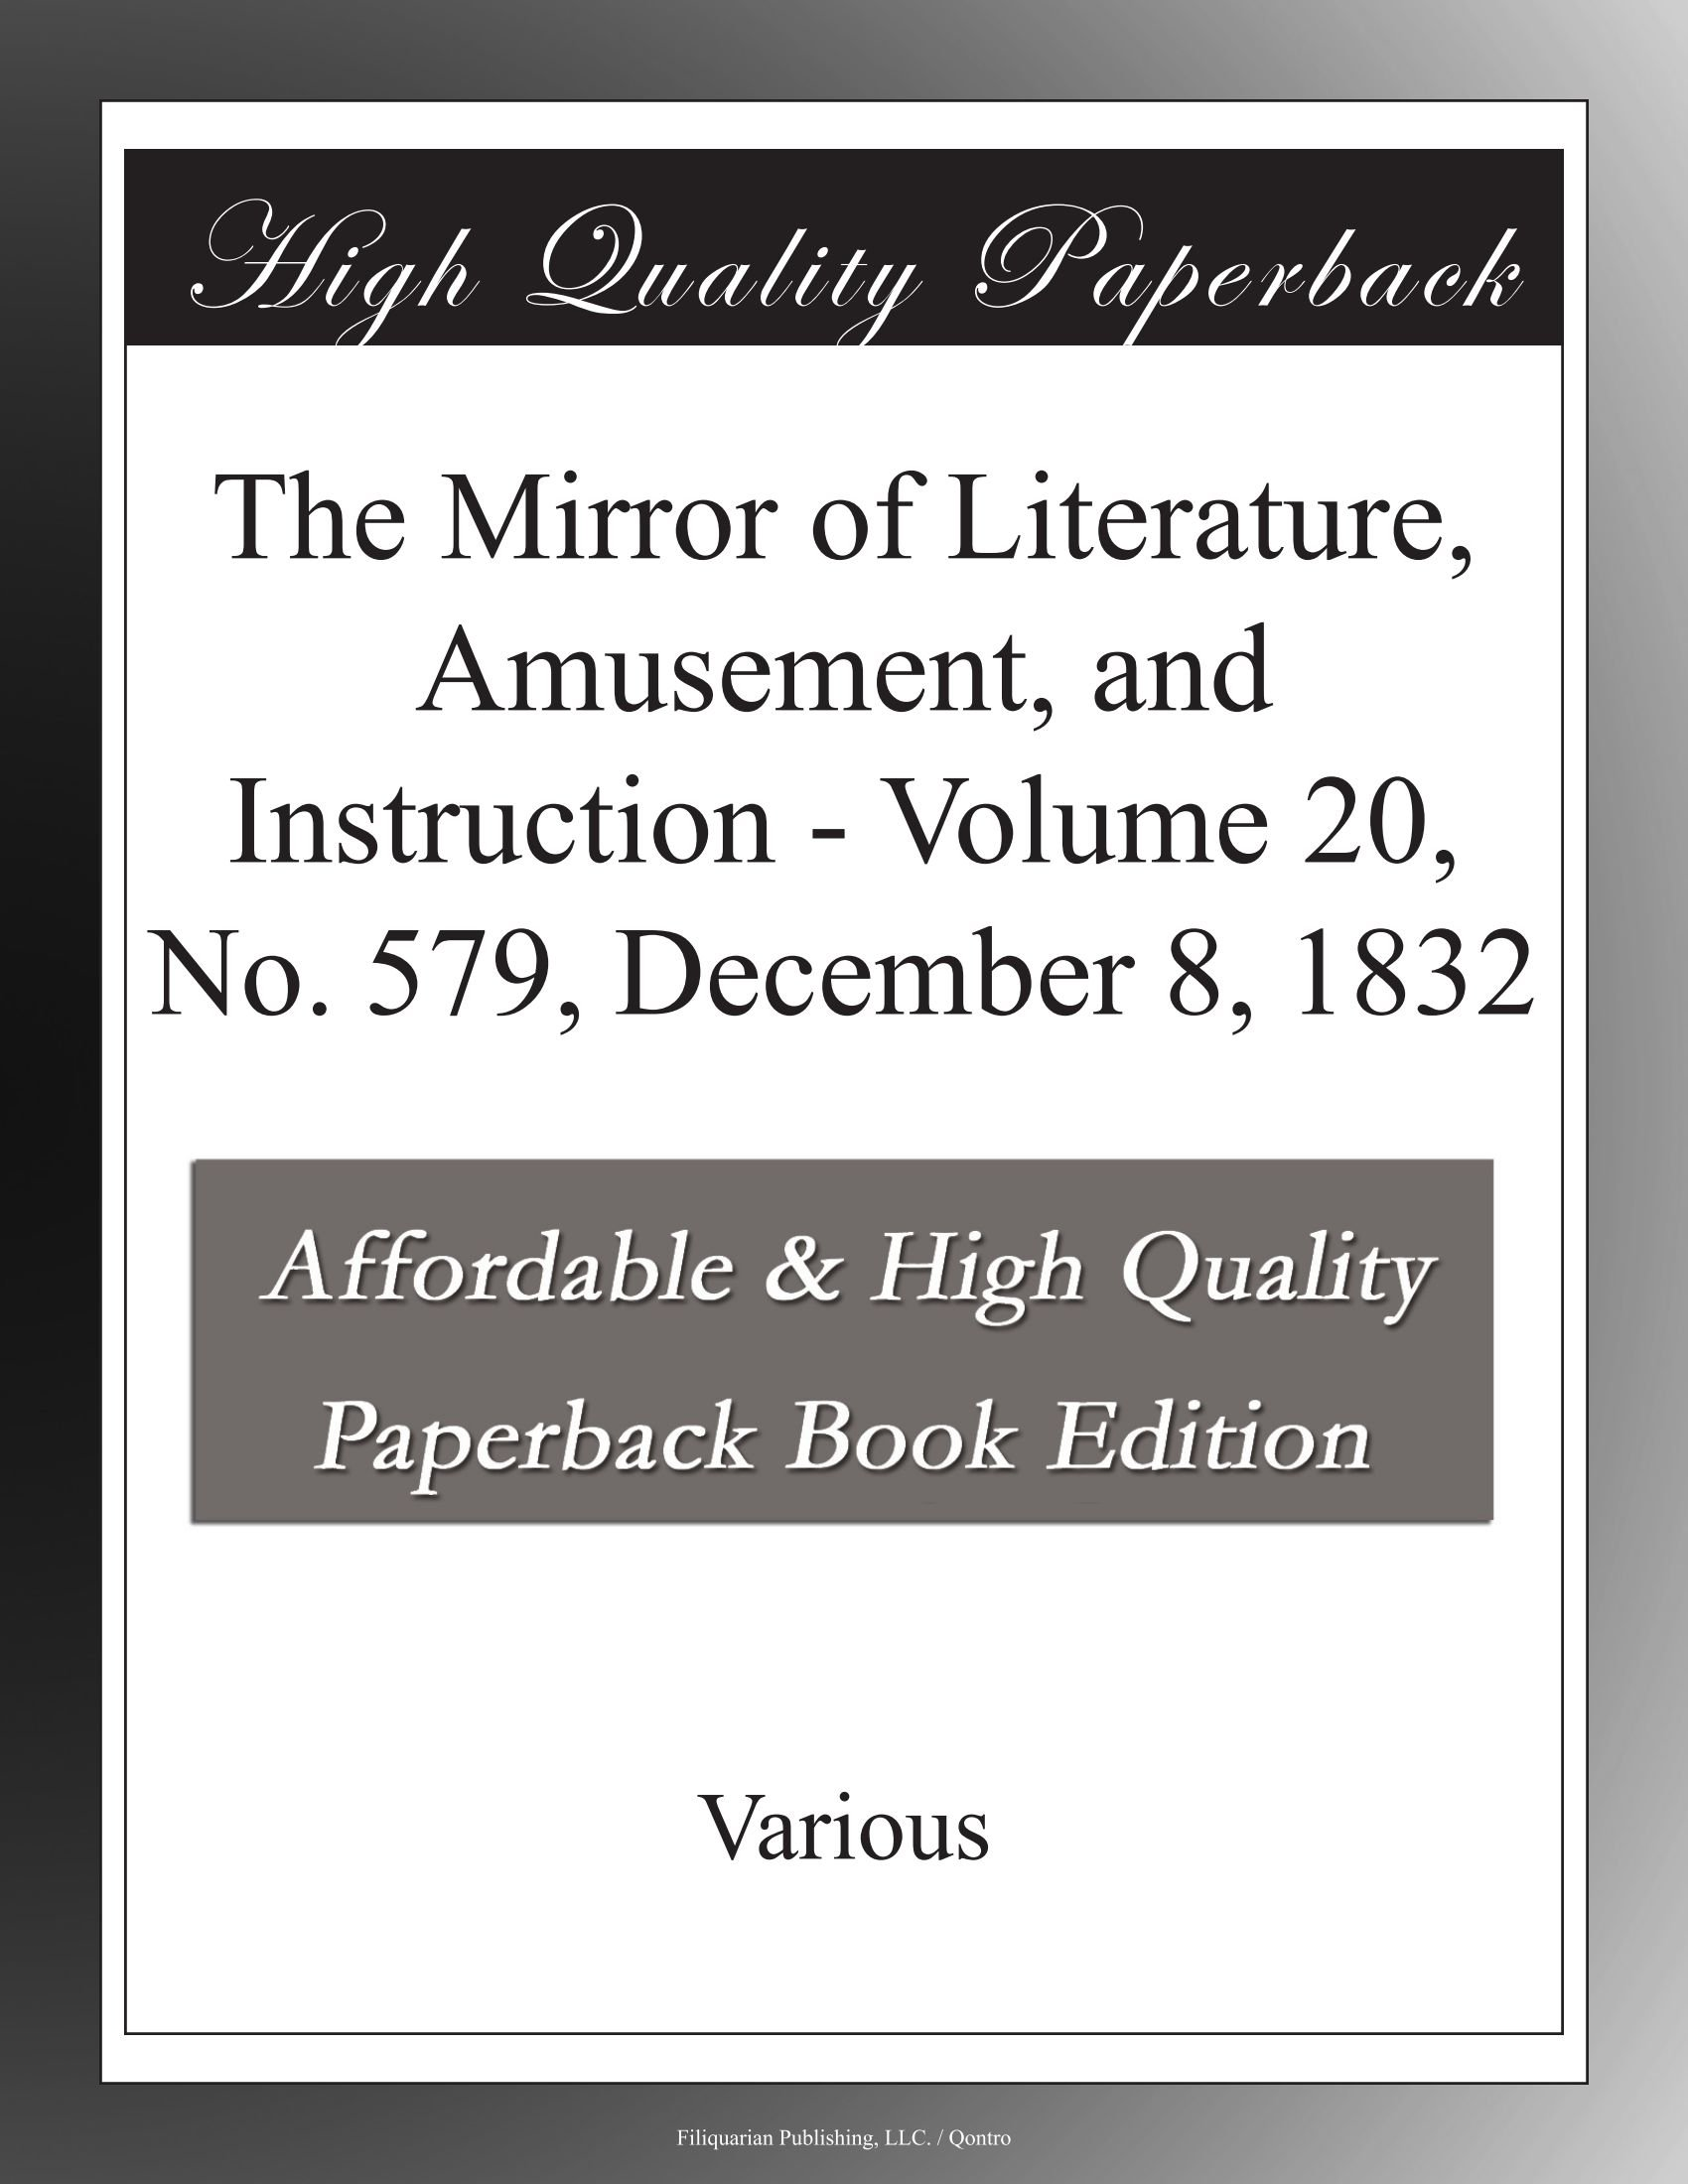 The Mirror of Literature, Amusement, and Instruction - Volume 20, No. 579, December 8, 1832 pdf epub